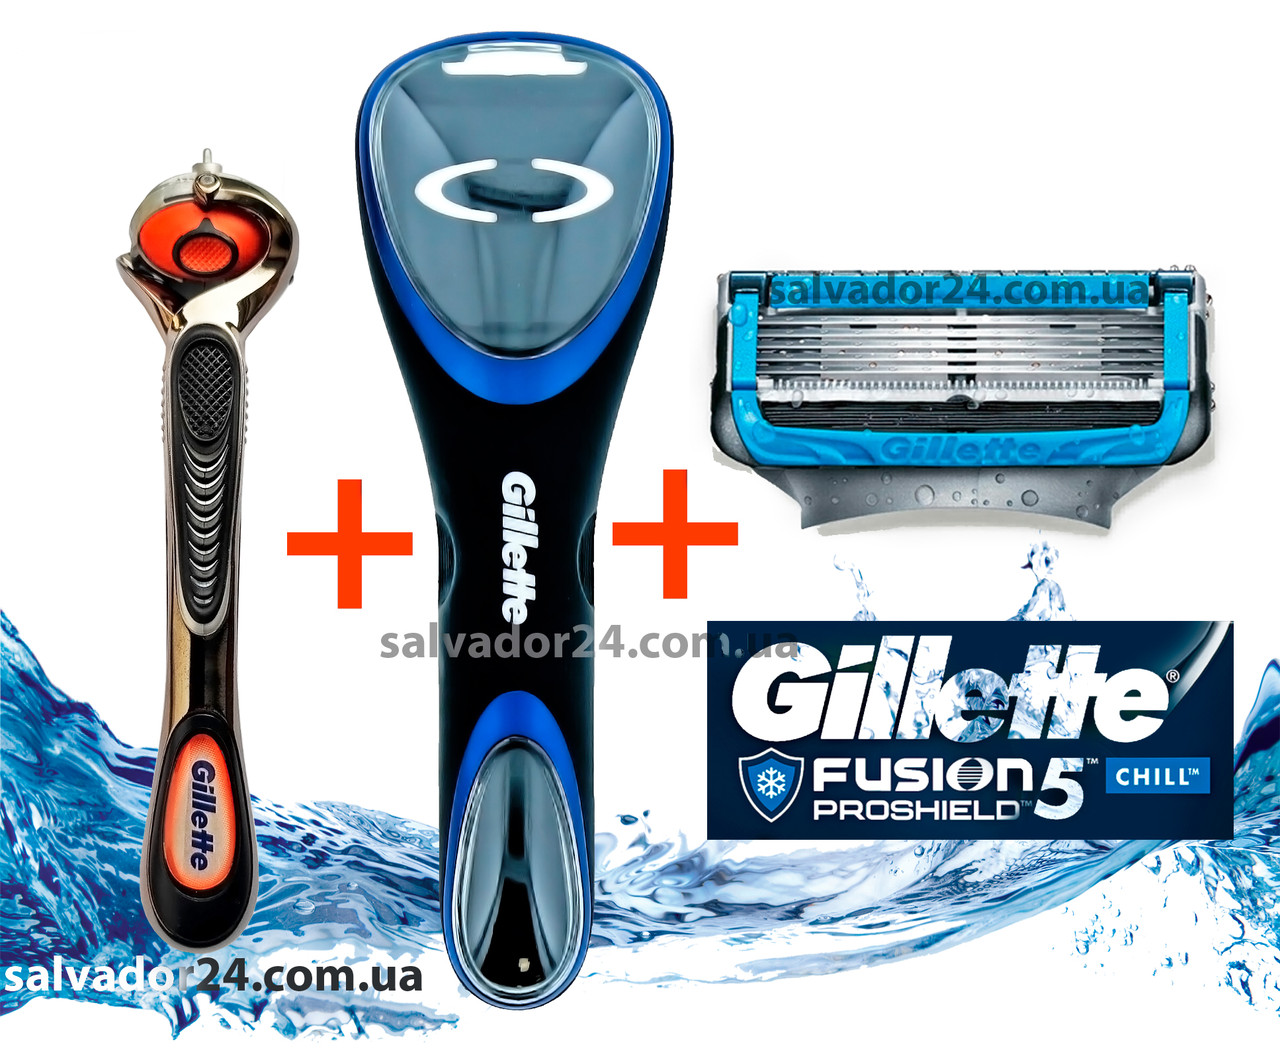 Комплект для бритья Gillette станок Flexball, футляр, Fusion ProShield Chill кассета для бритья оригинал США